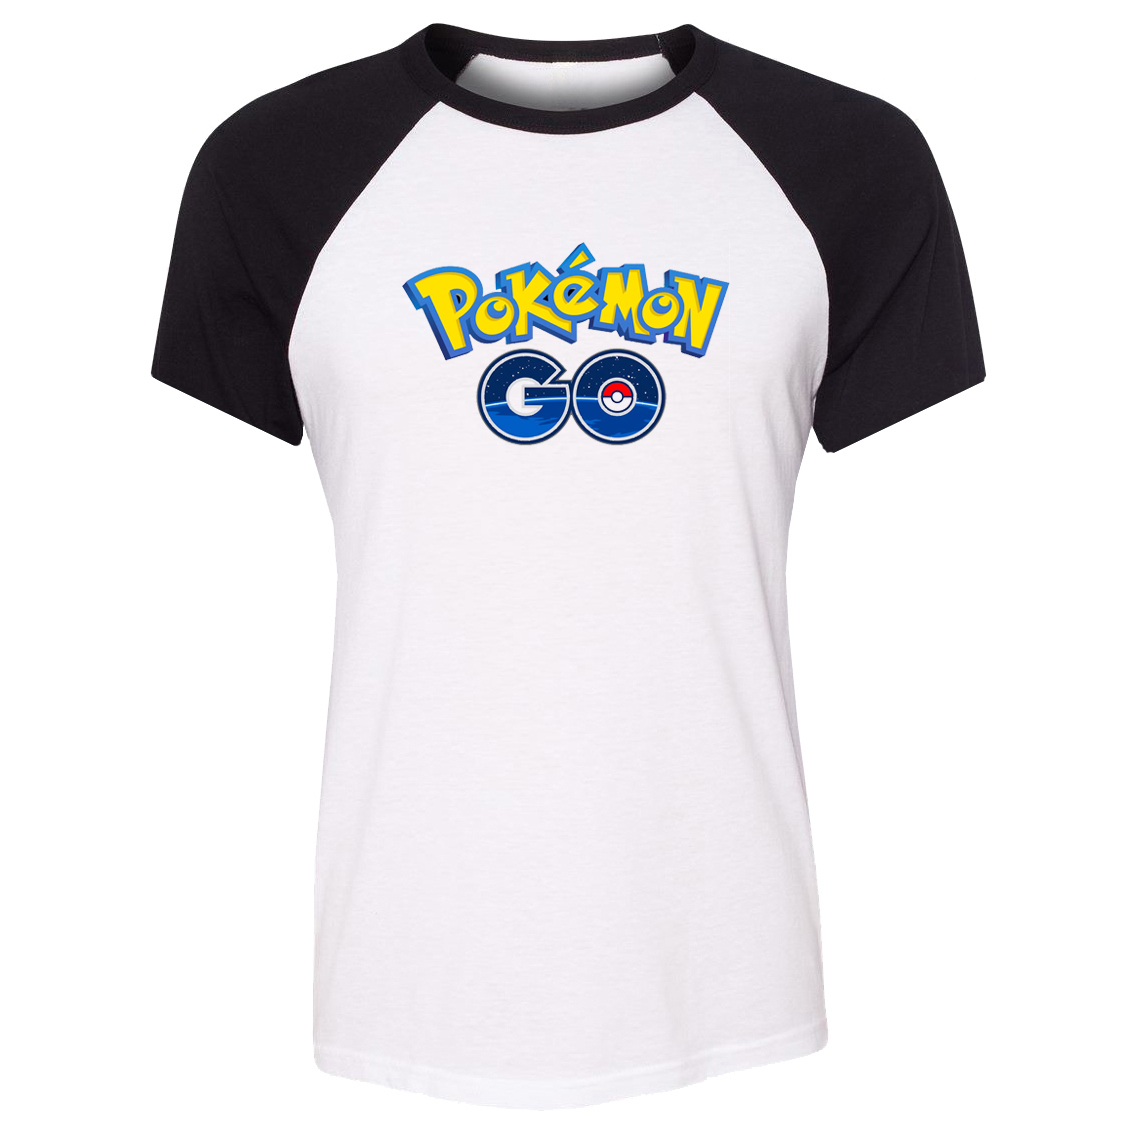 Summer T shirt font b Pokemon b font font b Go b font Game Fans Poke